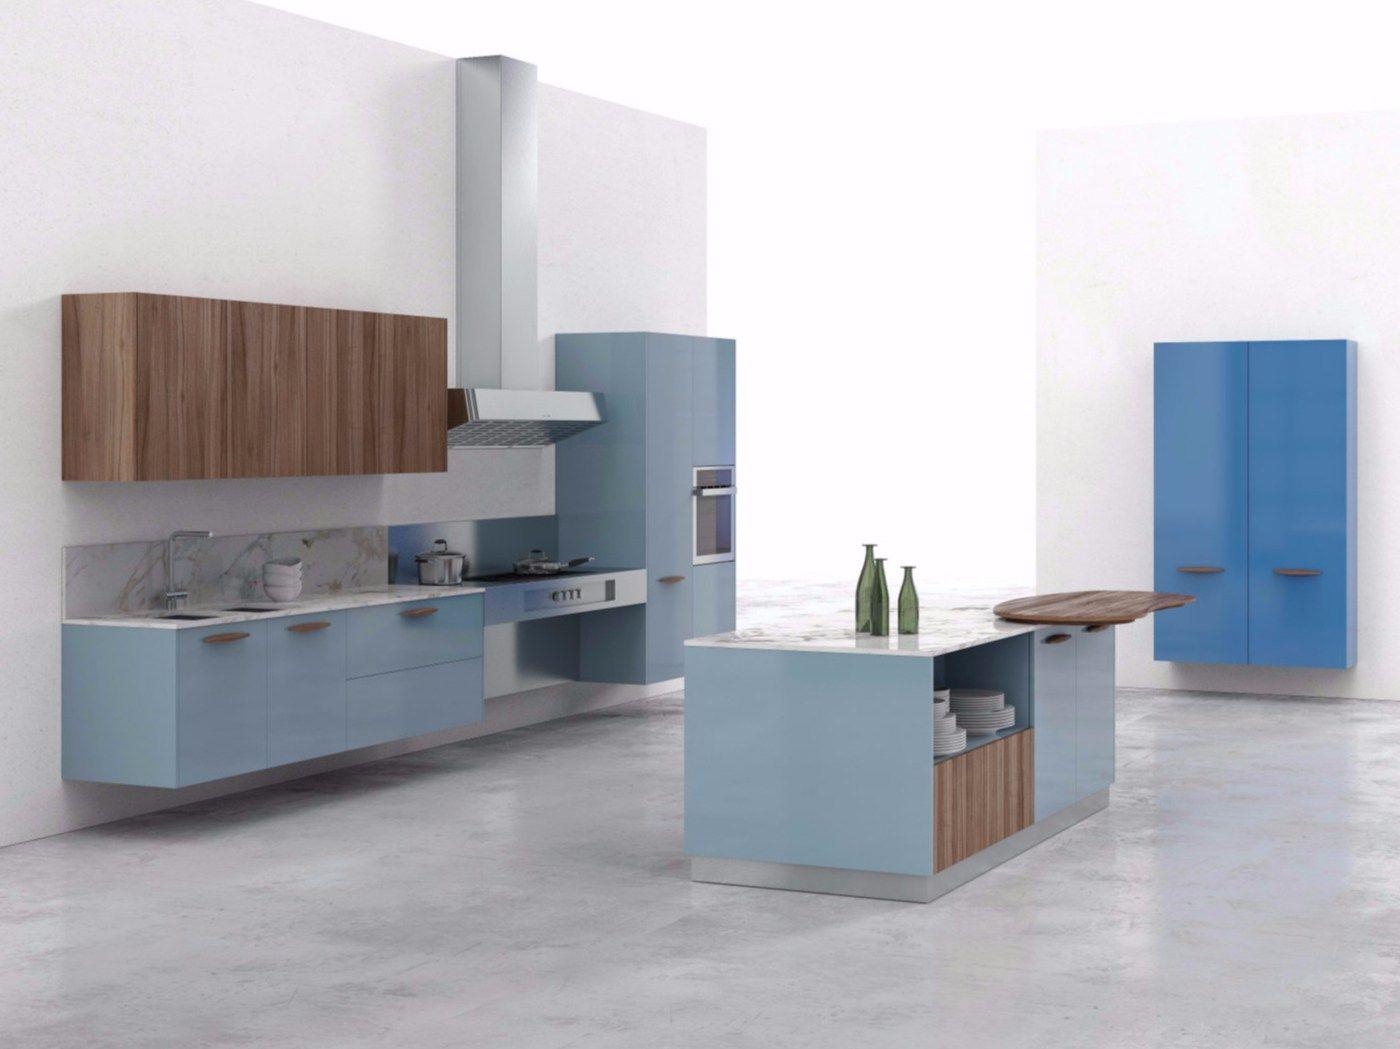 Emejing Cucine Cappellini Prezzi Ideas - Home Ideas - tyger.us